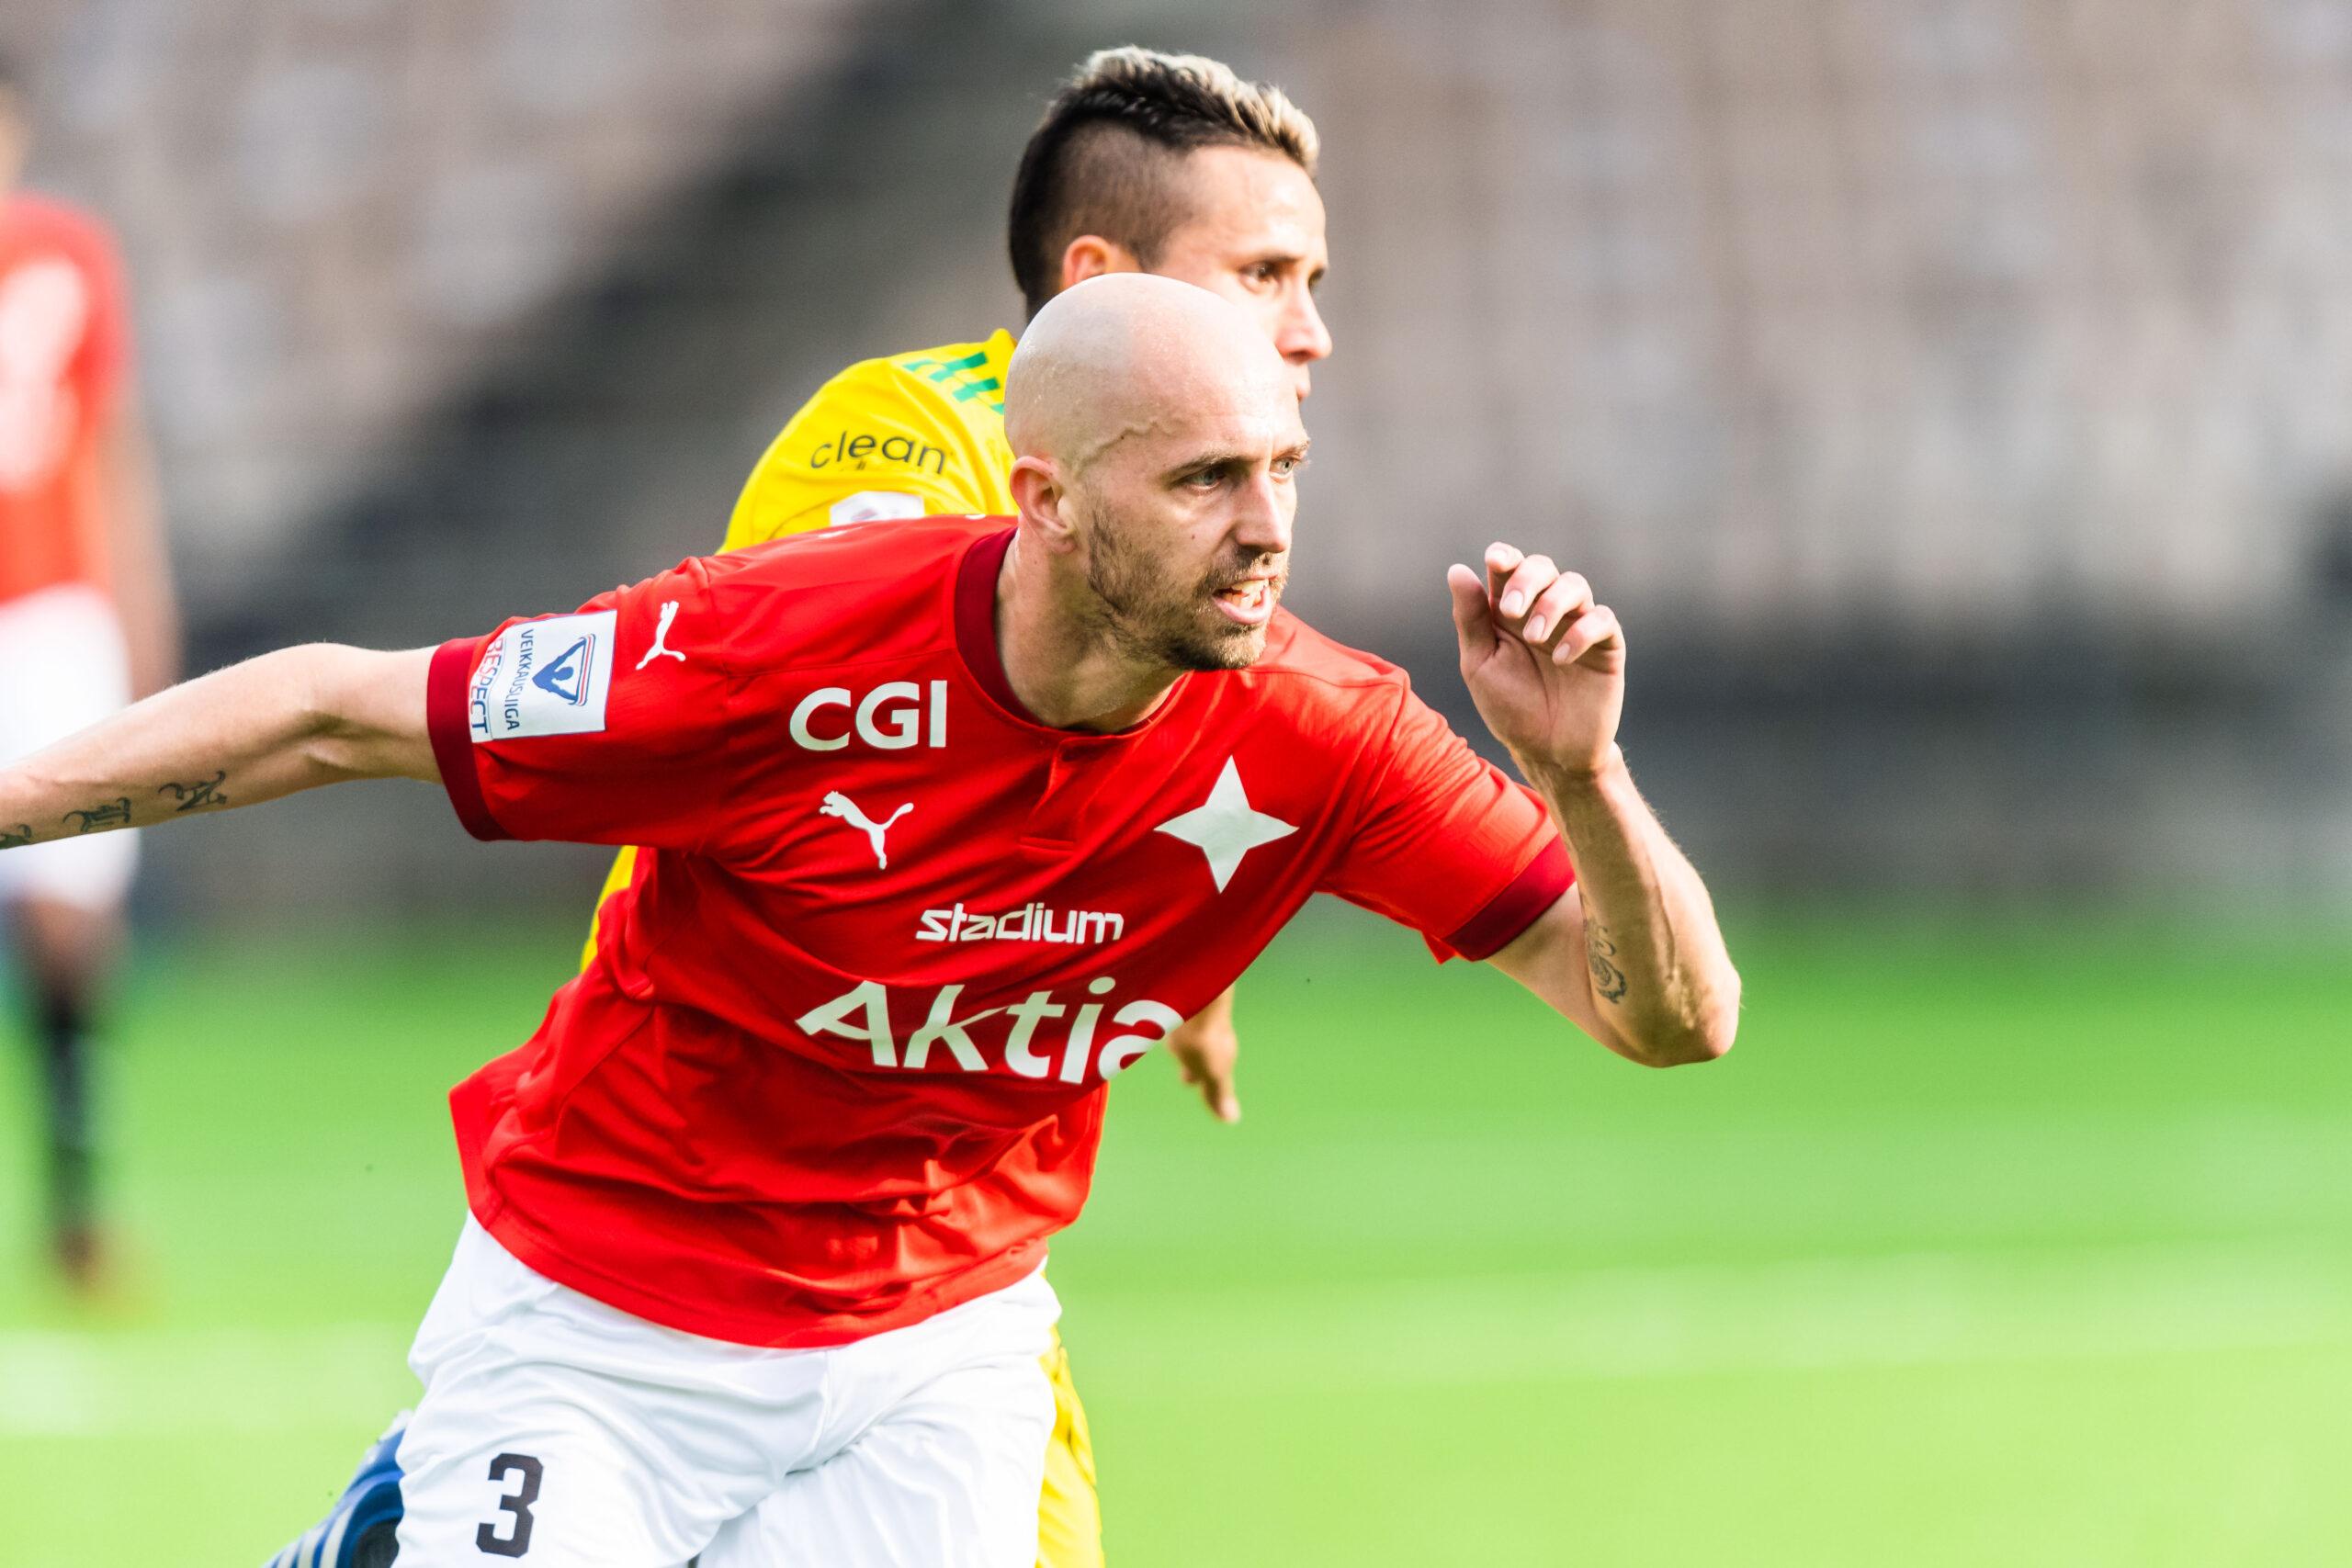 Inför matchen: HIFK möter AC Oulu på bortaplan i Uleåborg